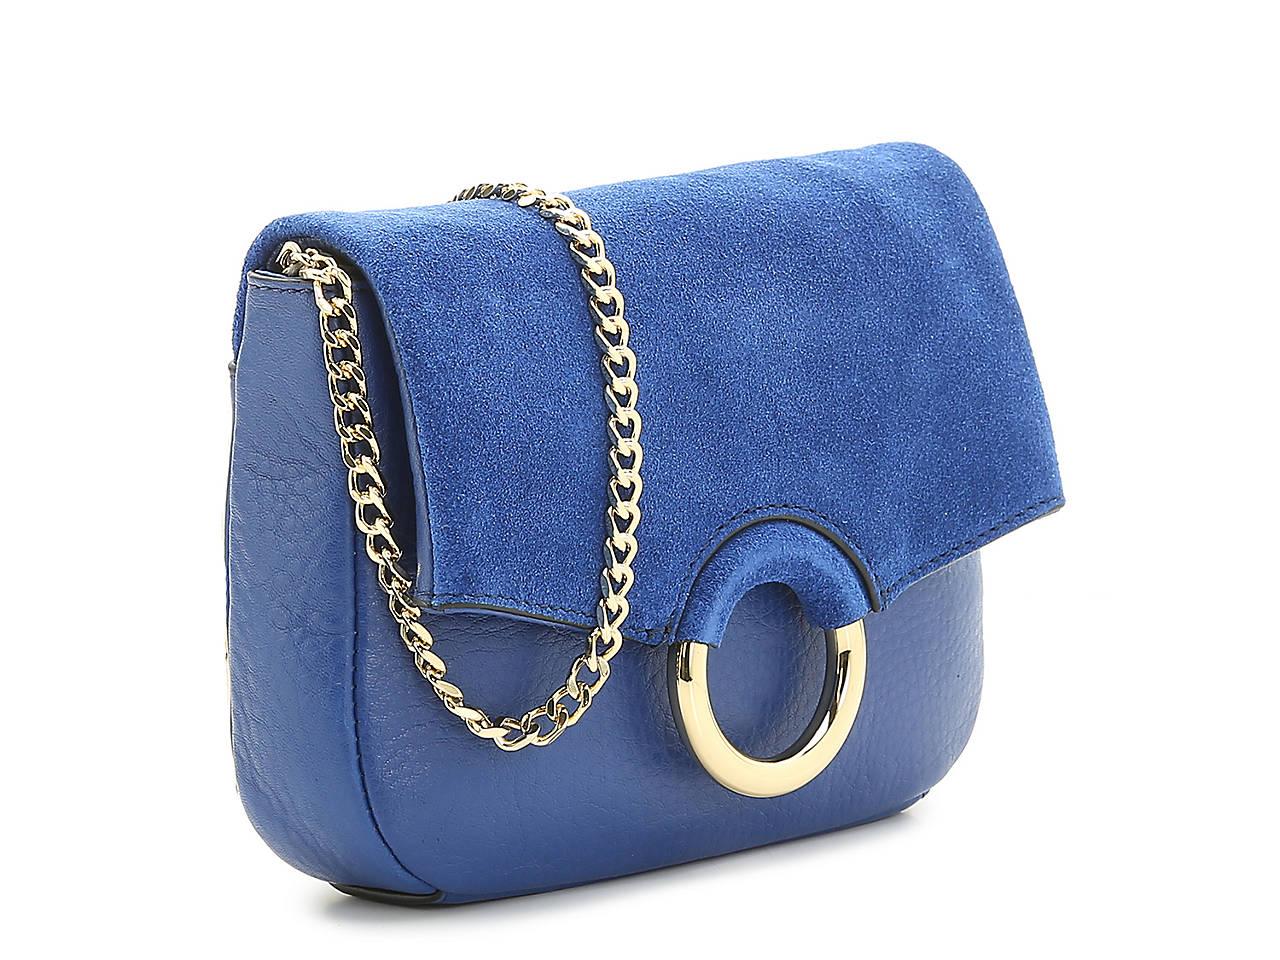 7434bcf8a176 Vince Camuto Adina Leather Crossbody Bag Women s Handbags ...